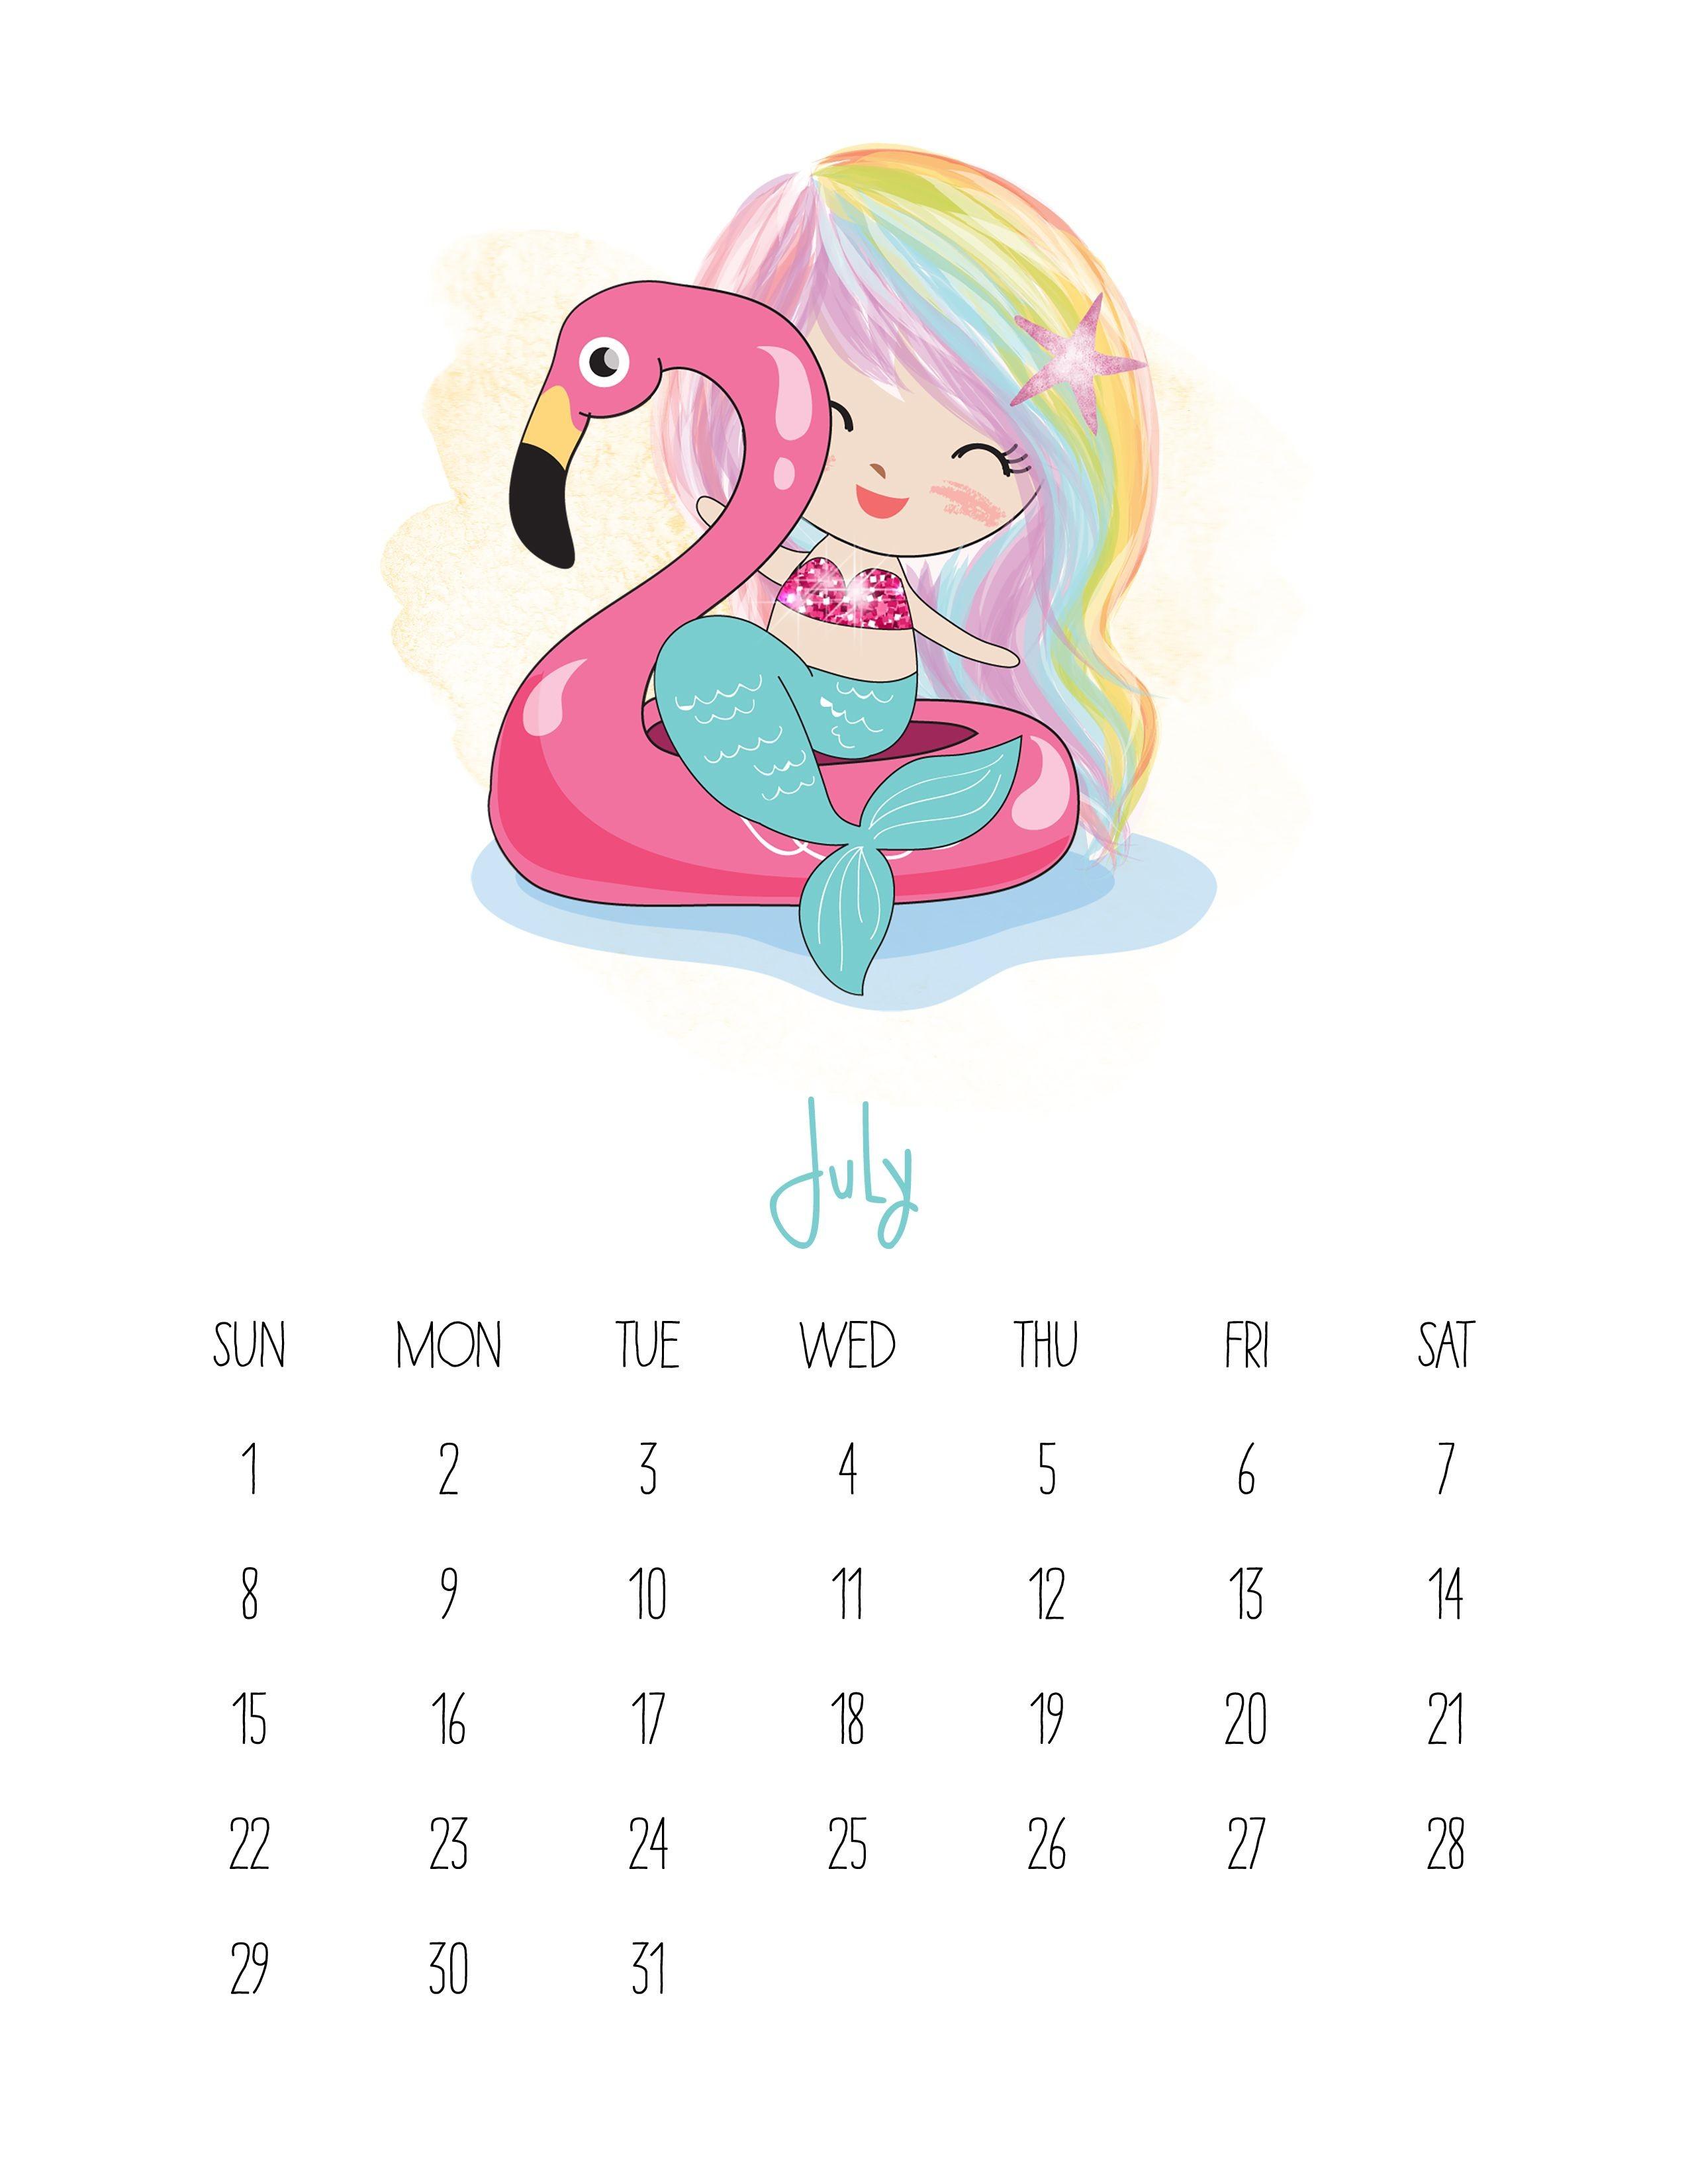 Calendario 2019 Gratis Para Imprimir Más Recientes Pin De СветРана Острикова En Tag Pinterest